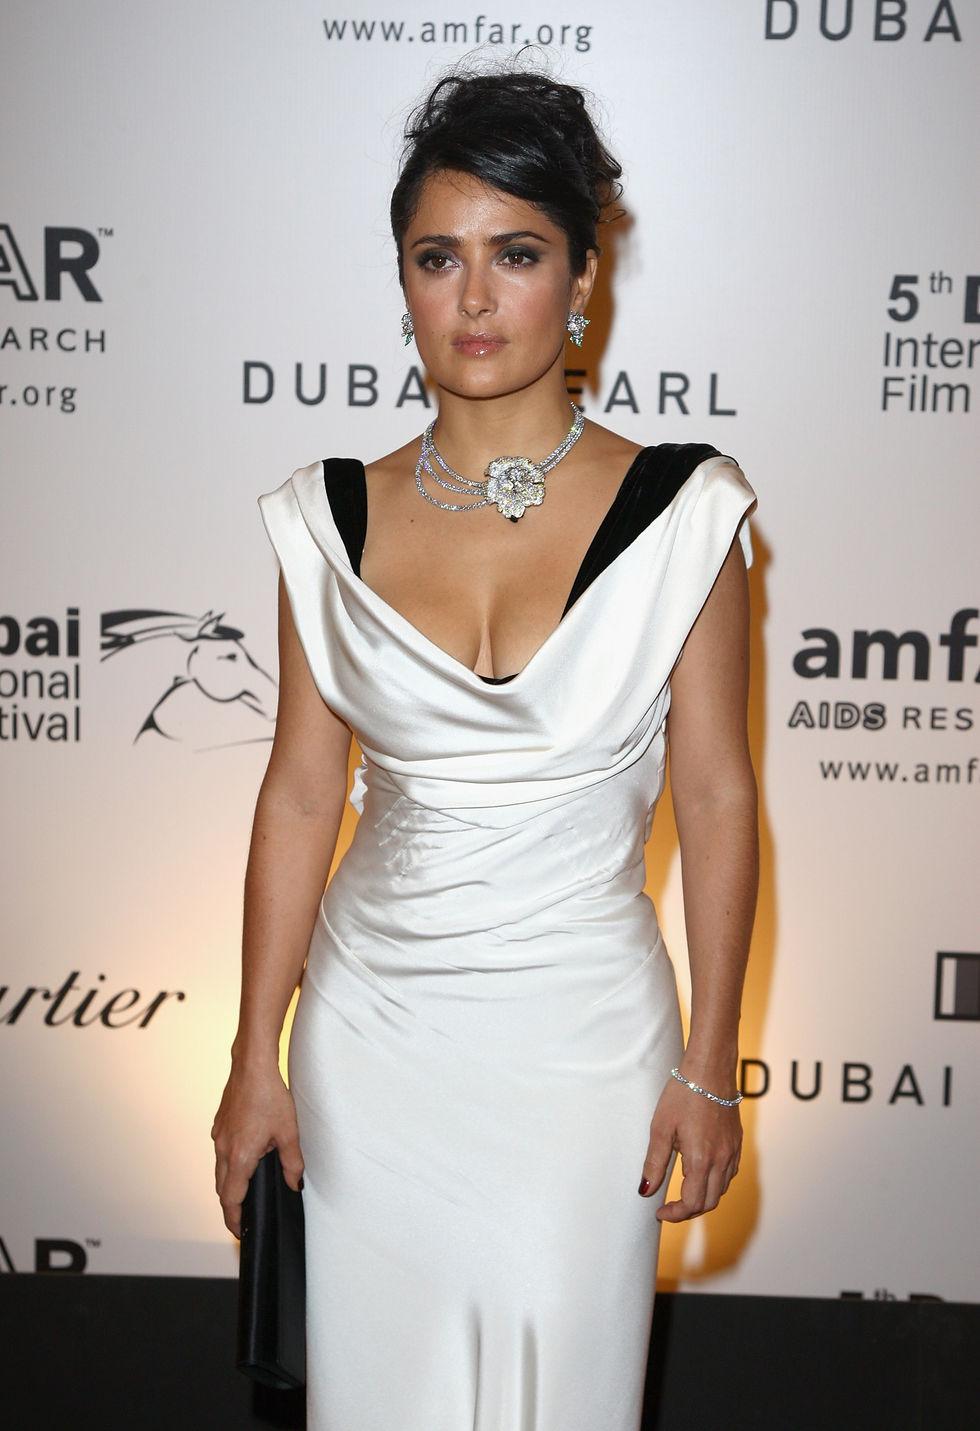 salma-hayek-2nd-annual-amfar-cinema-against-aids-dubai-gala-01